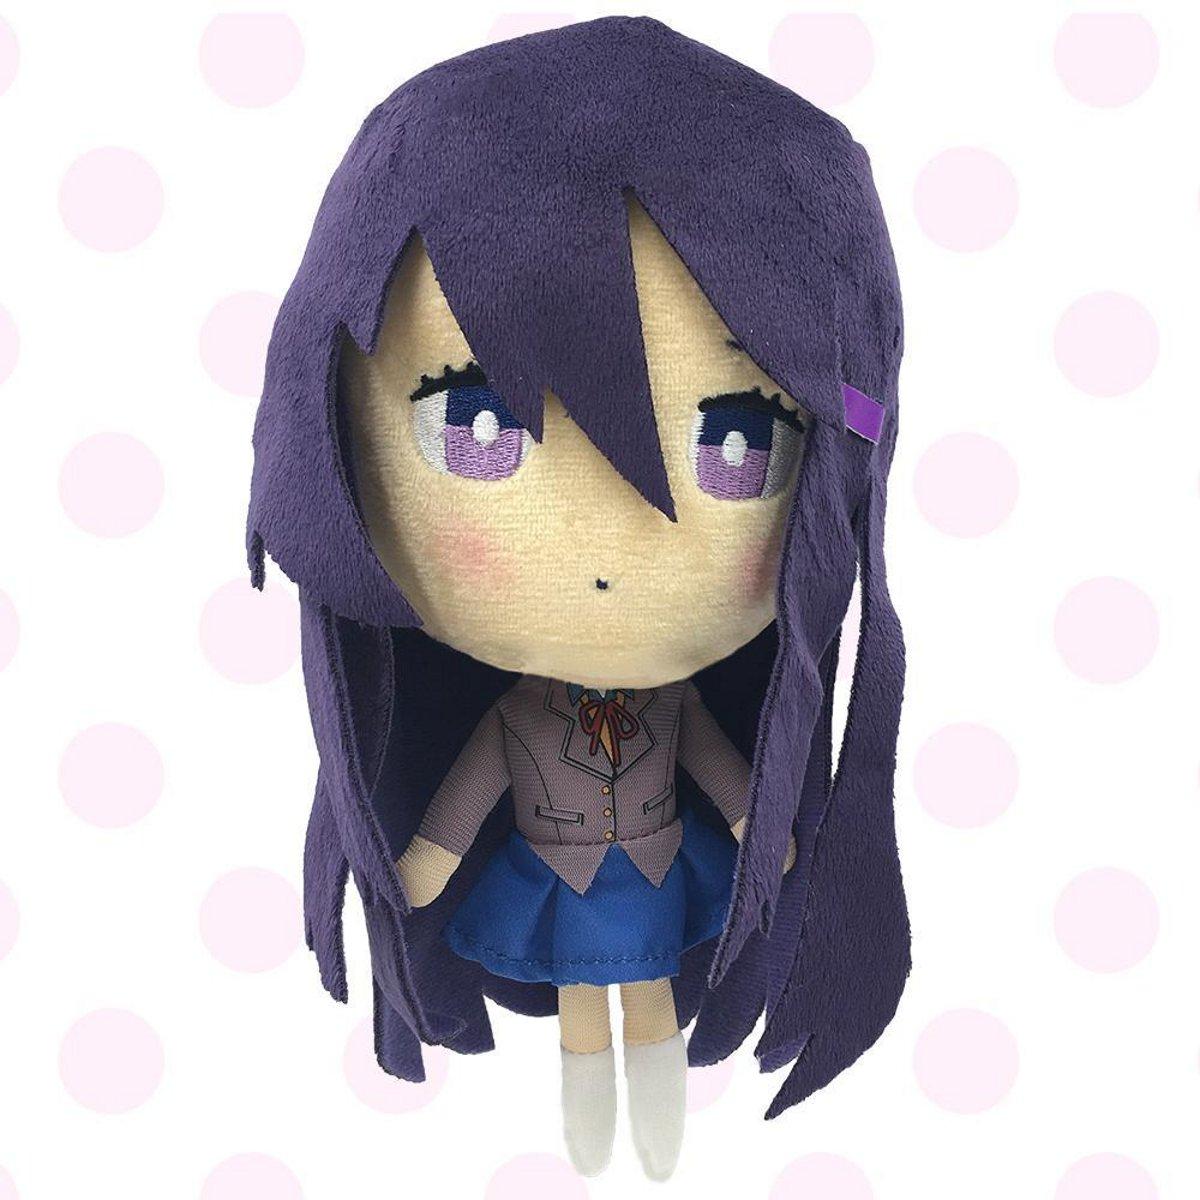 Yuri Plush Figure